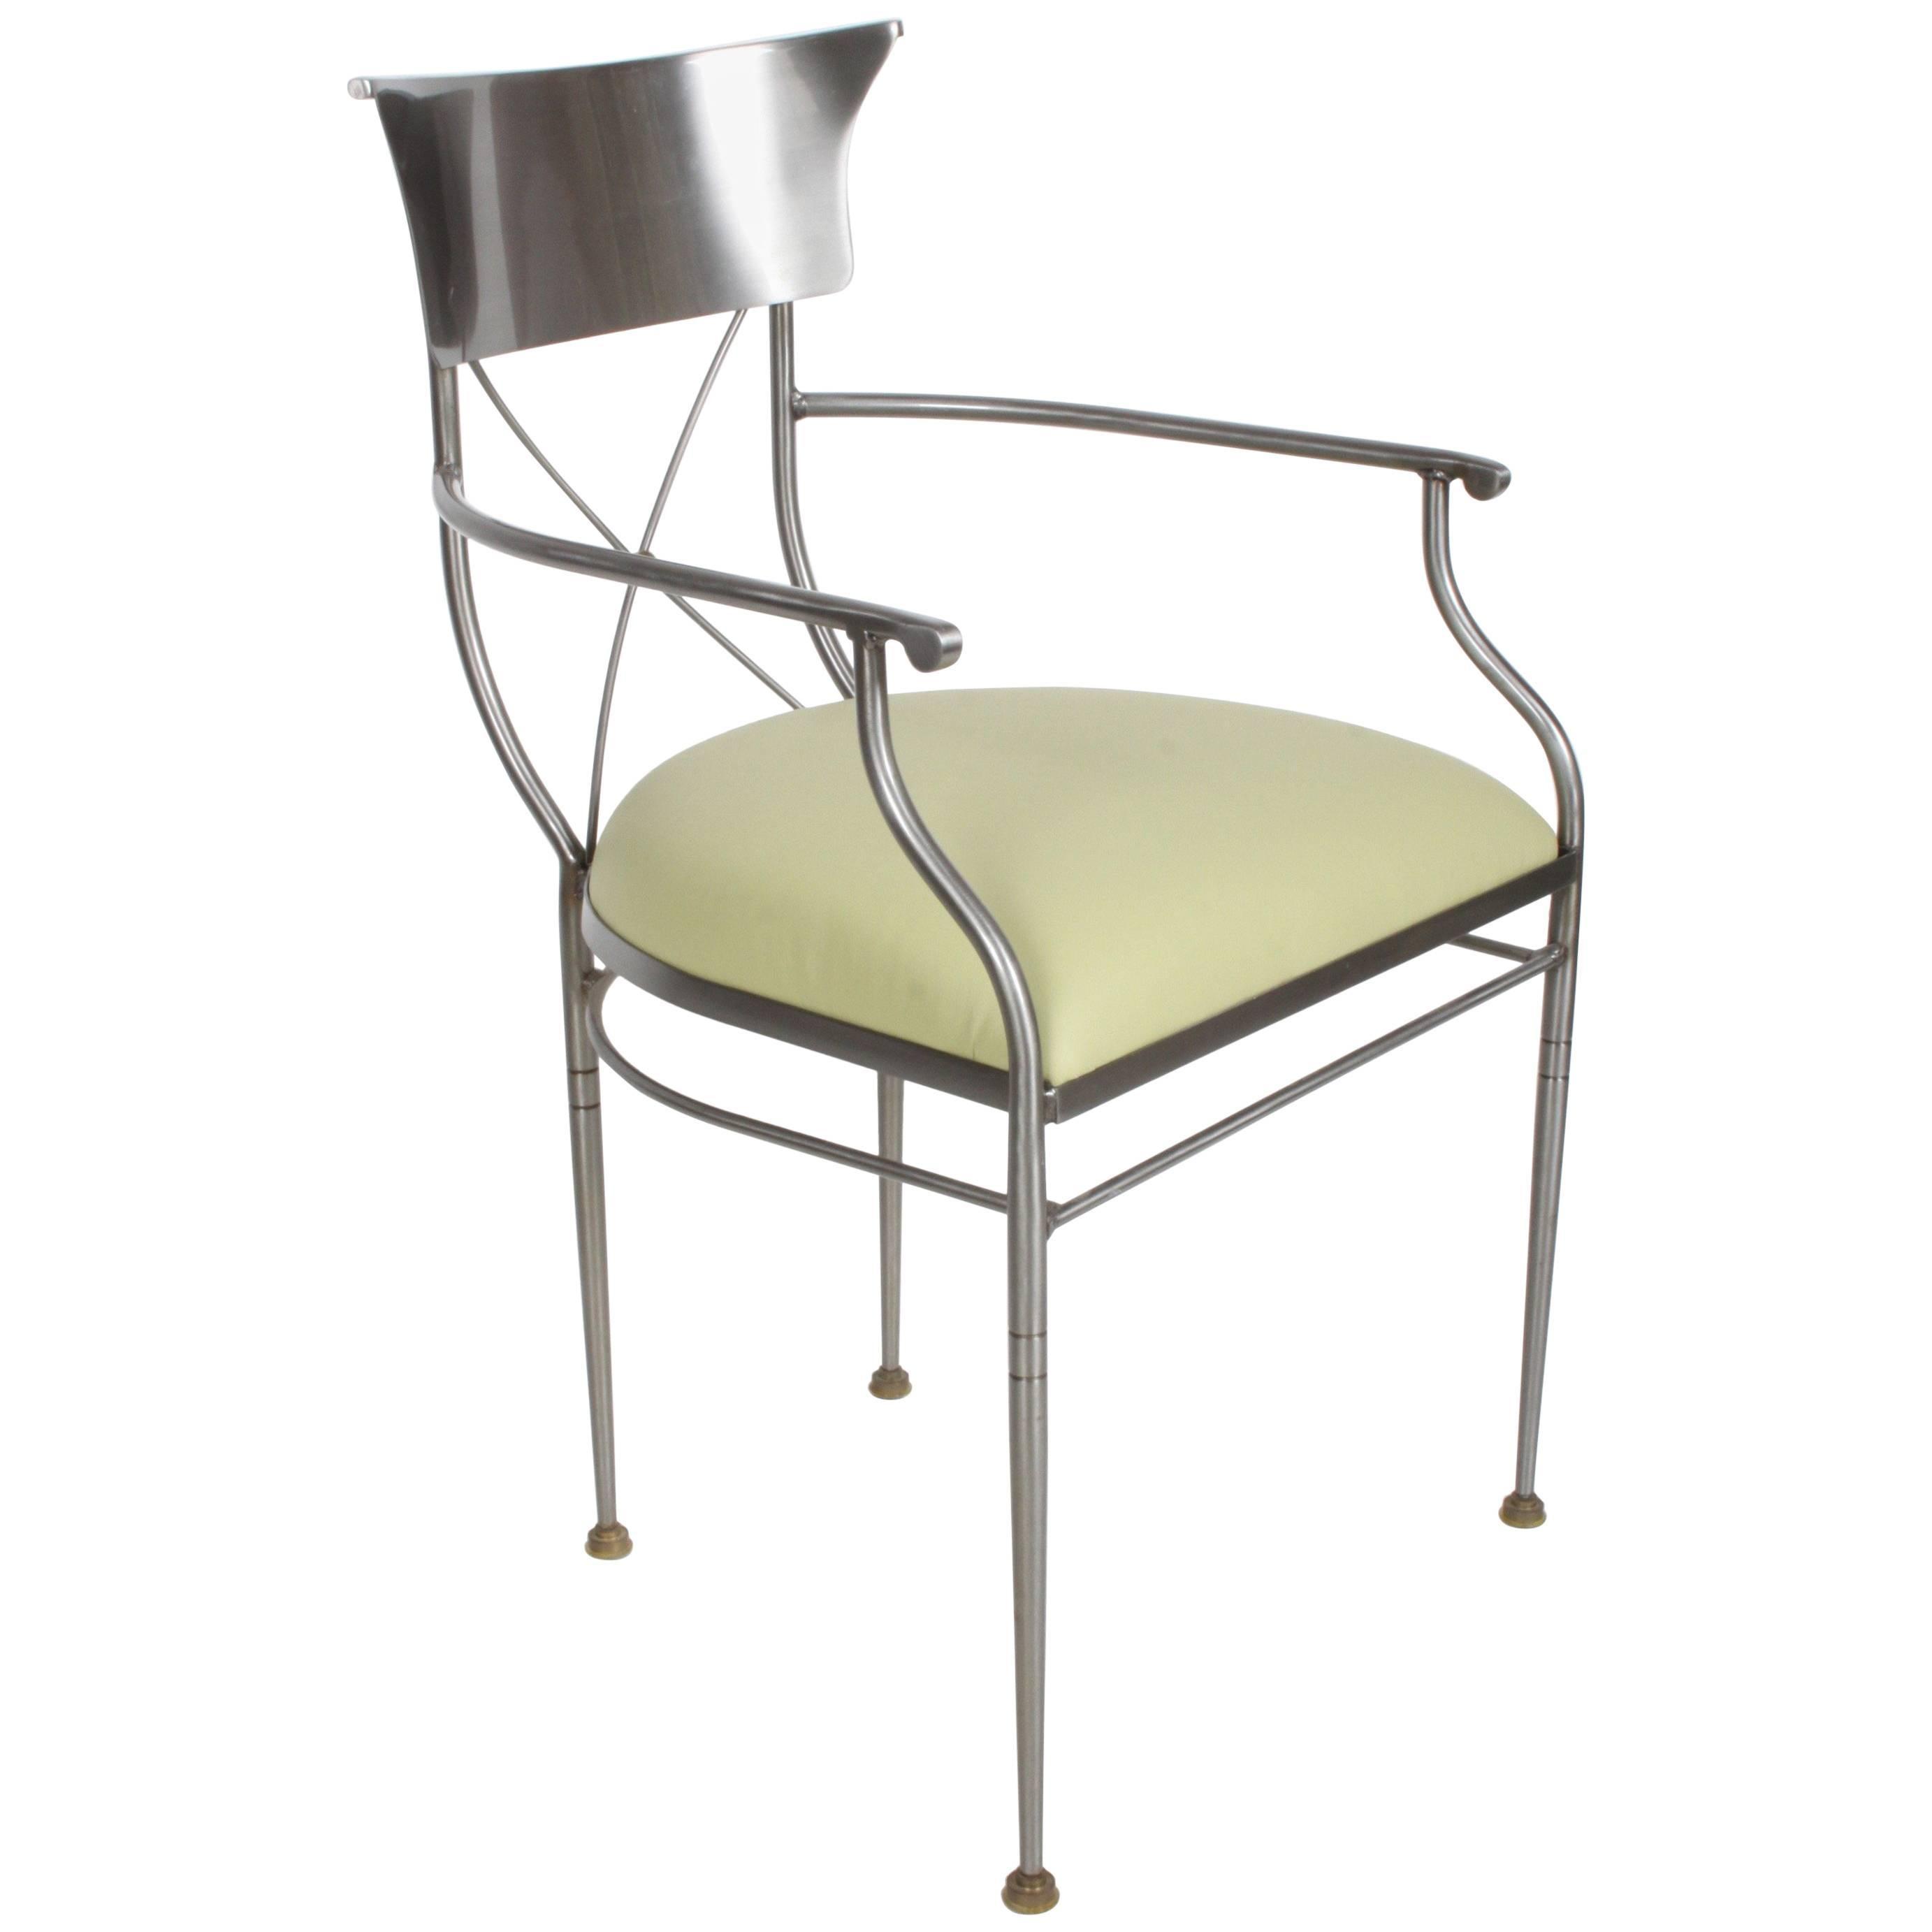 Swaim Modern Neoclassical Form Desk Or Armchair